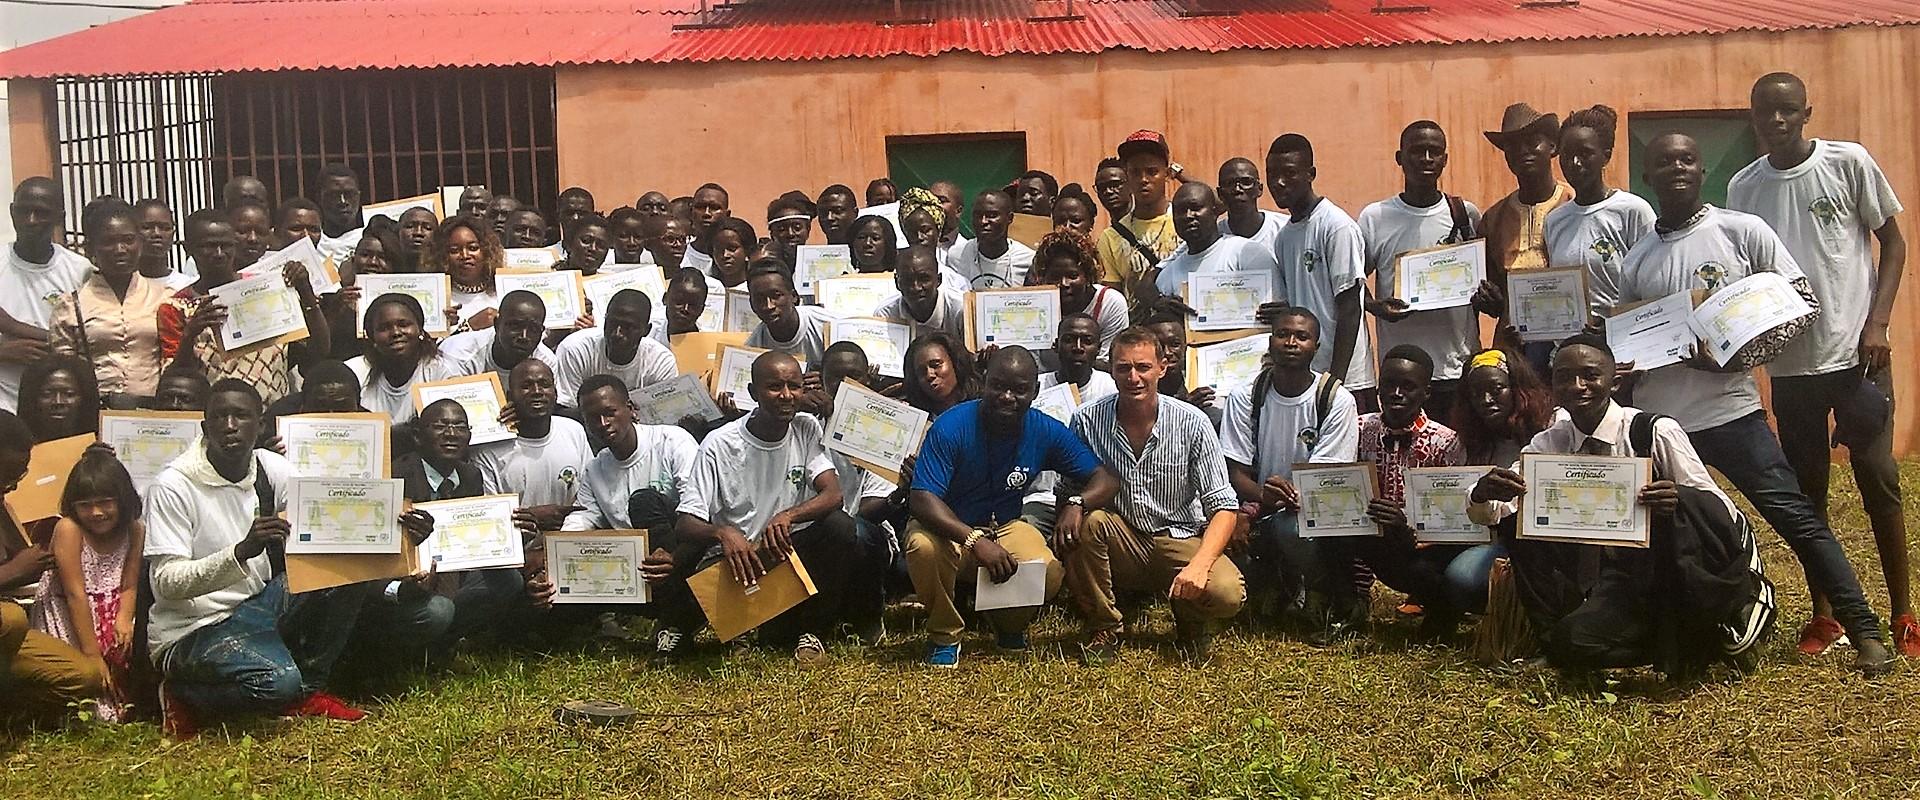 consegna diplomi_guinea bissau_mani tese_2017